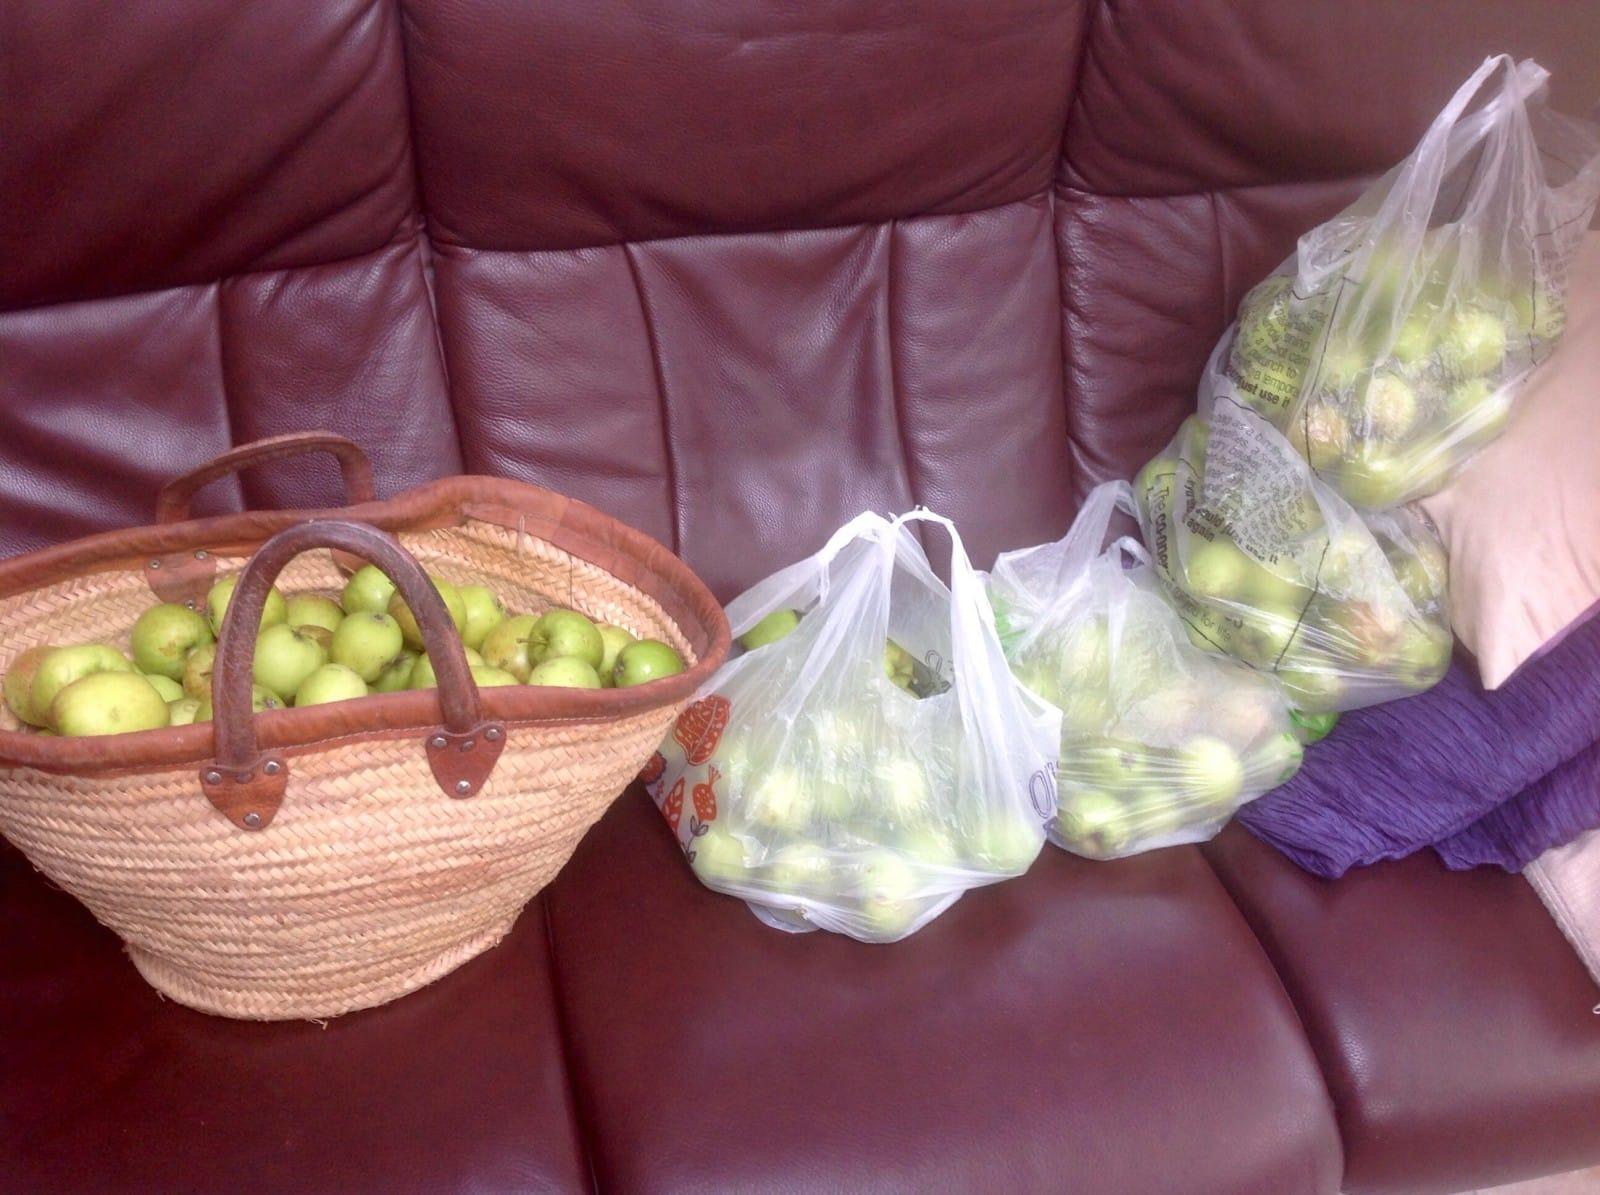 Fiesta apples